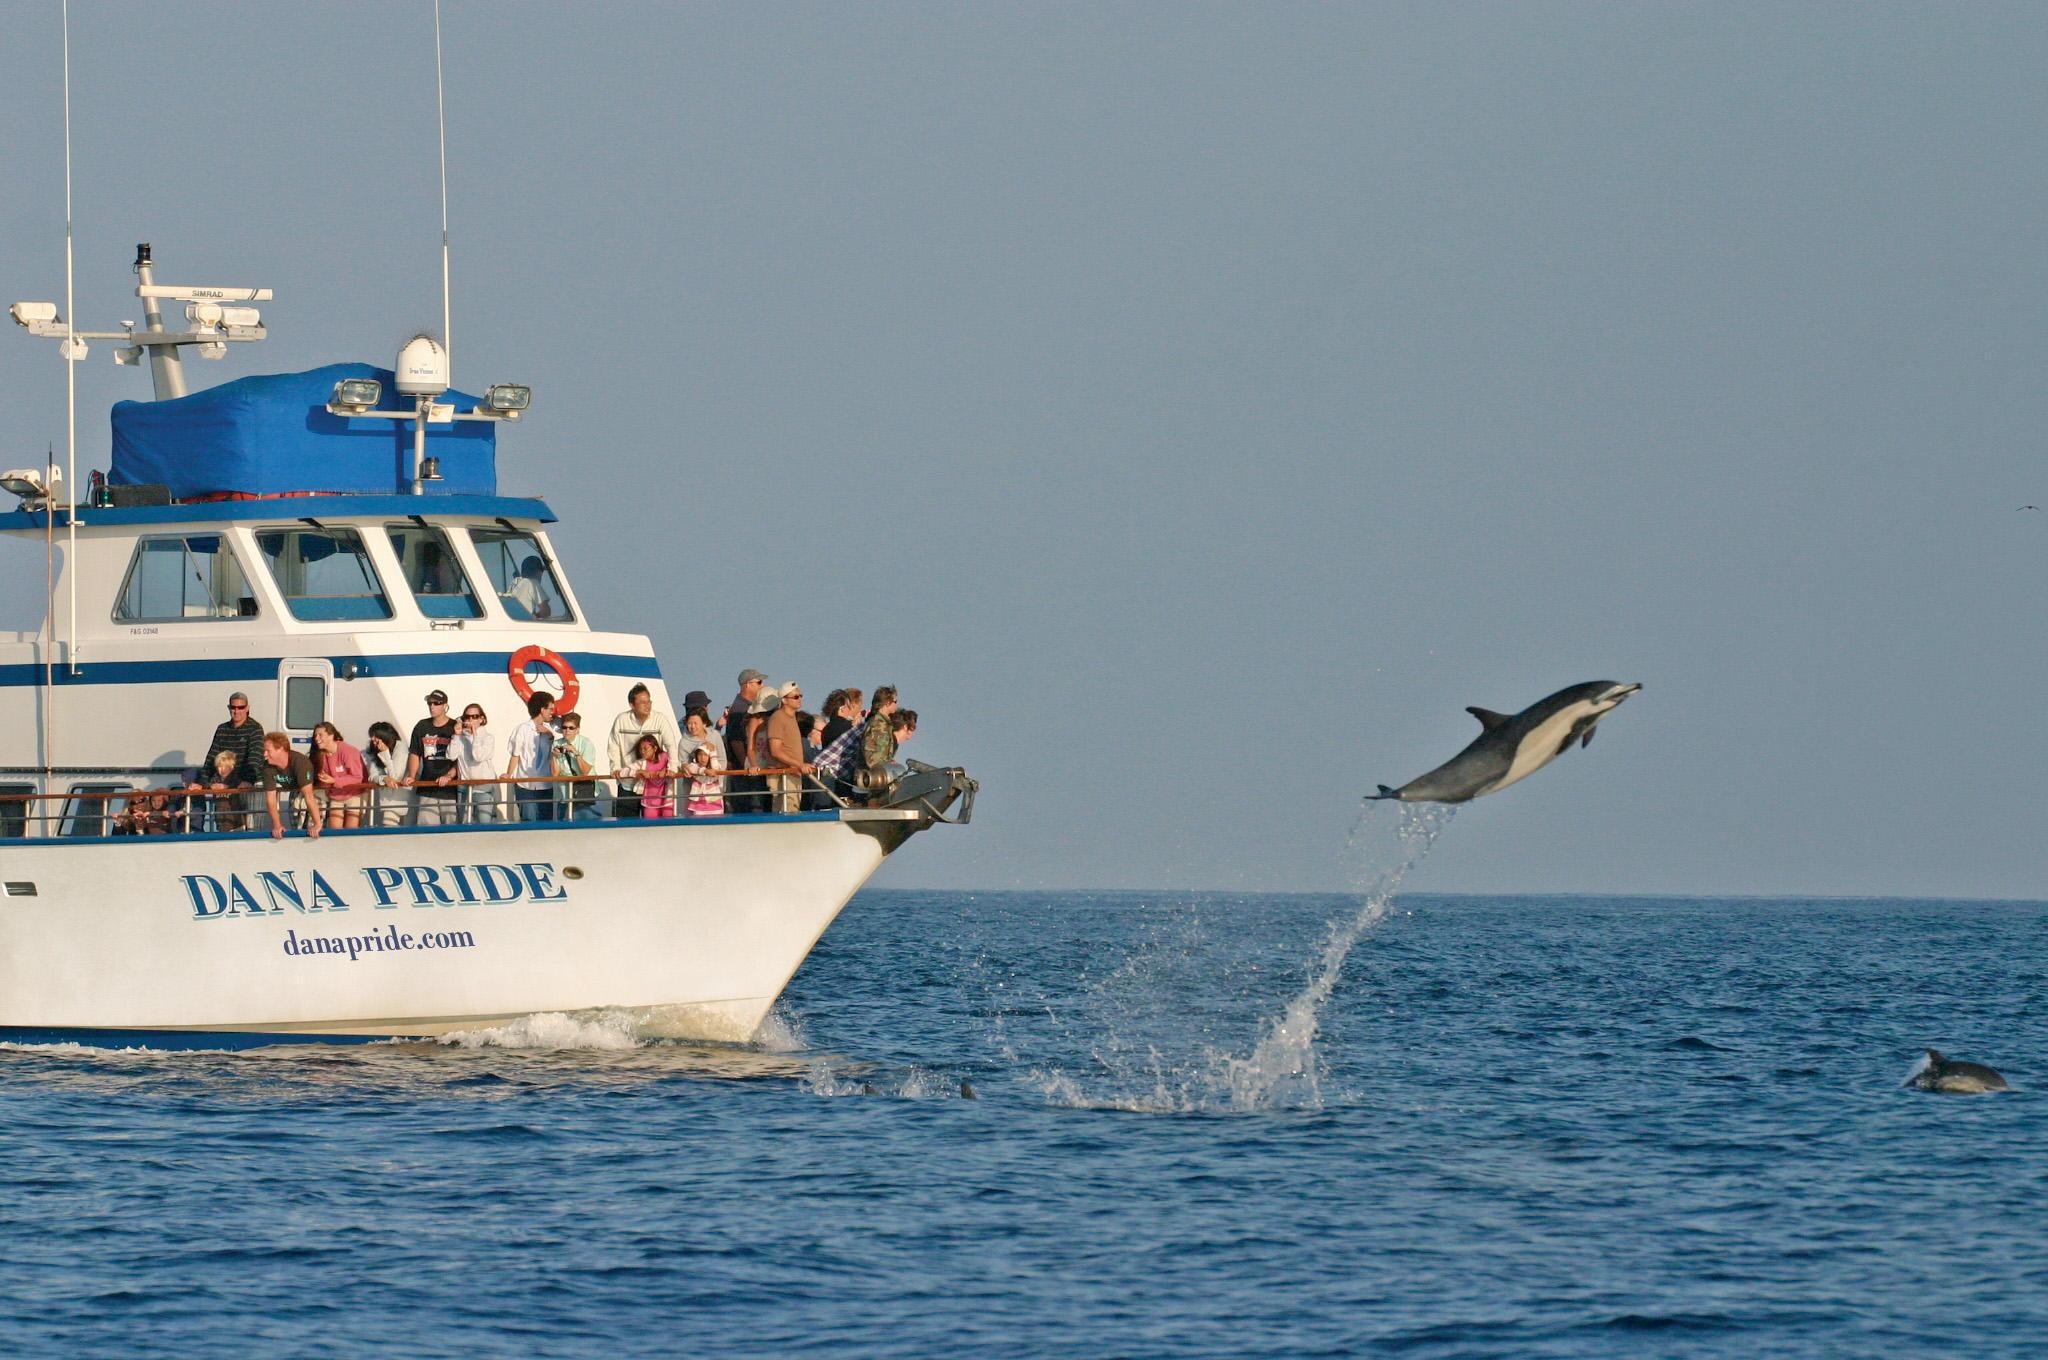 GALLERY-Dana-Wharf-Sportfishing-Whale-Wa